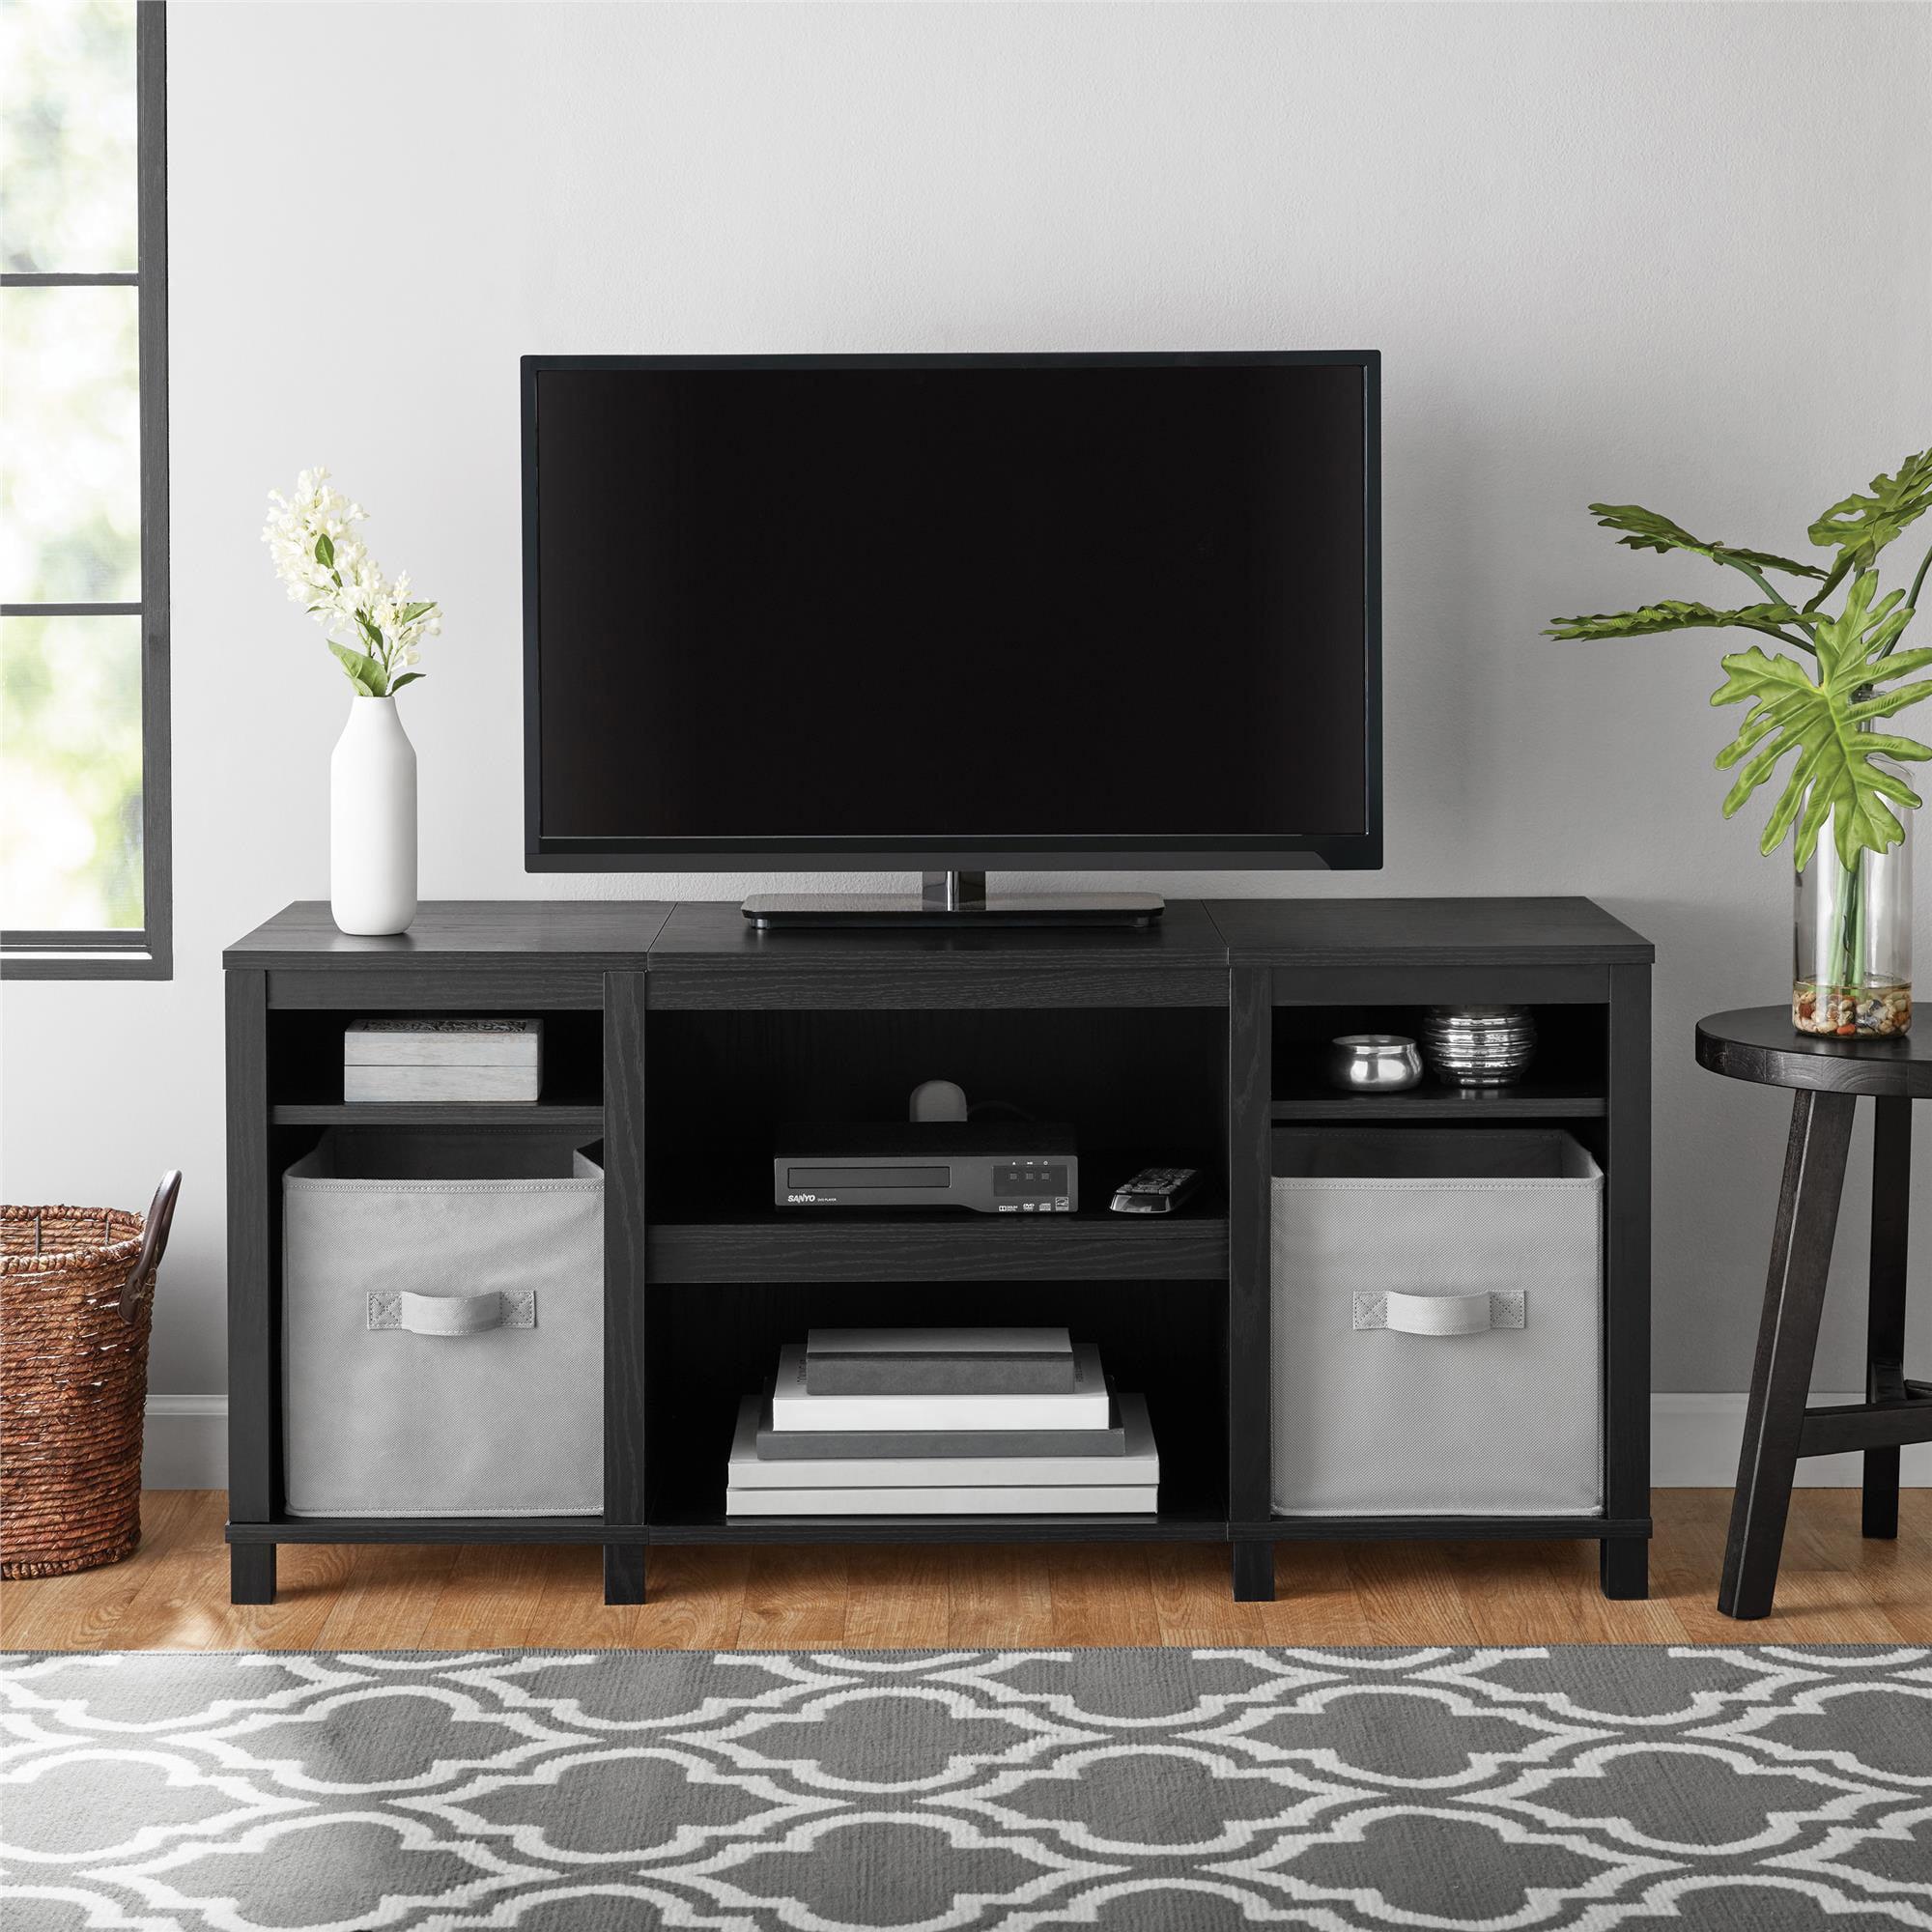 Rustic Wood Tv Stand Furniture Living Room Entertainment Center Black Vintage